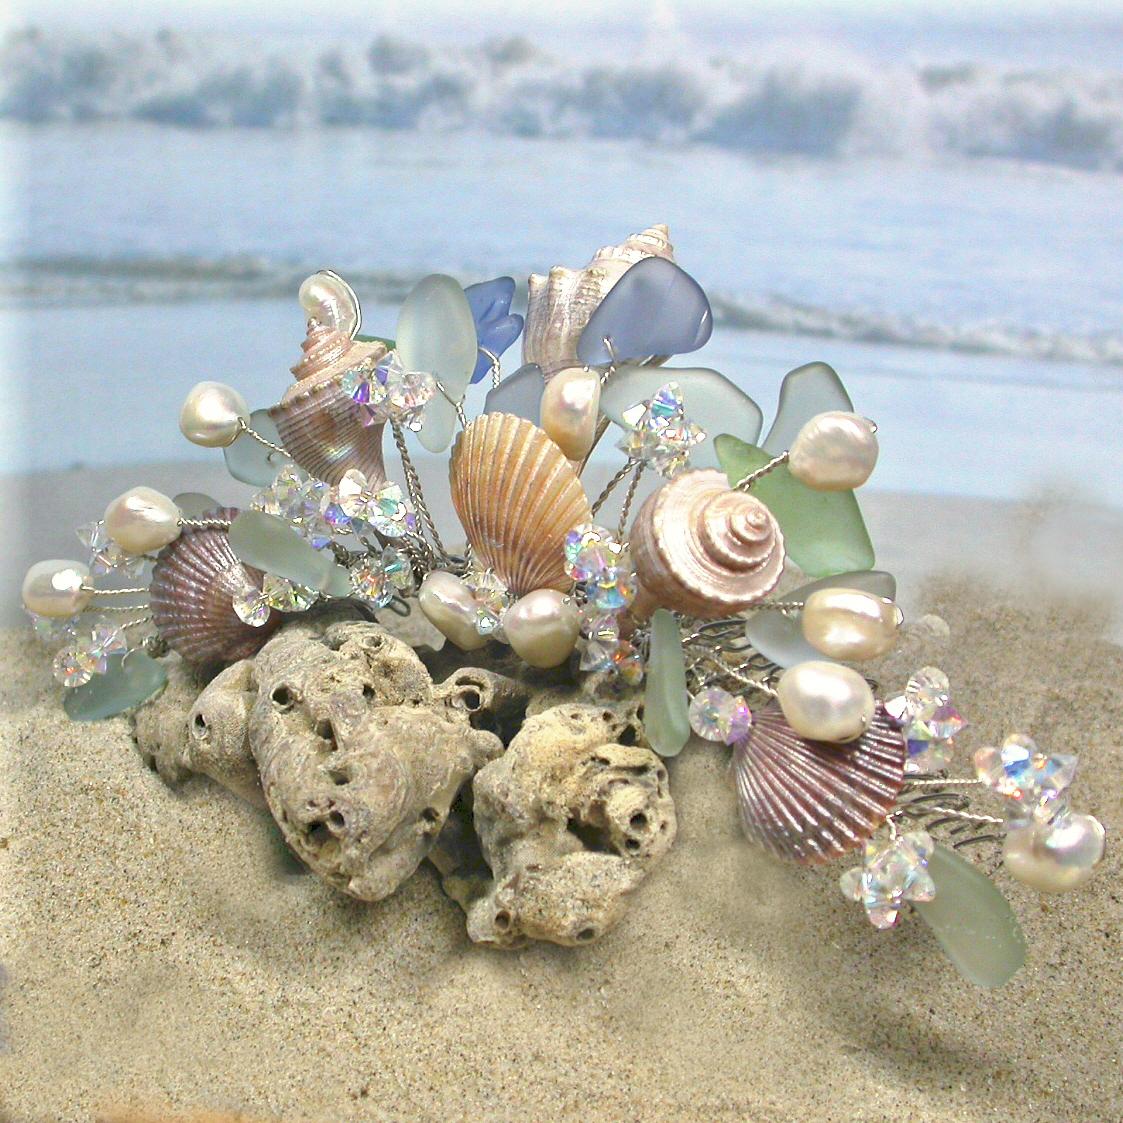 Beauty, Jewelry, white, blue, green, silver, Beach, Wedding, Hair, Bridal, Ocean, Headpiece, Seaglass